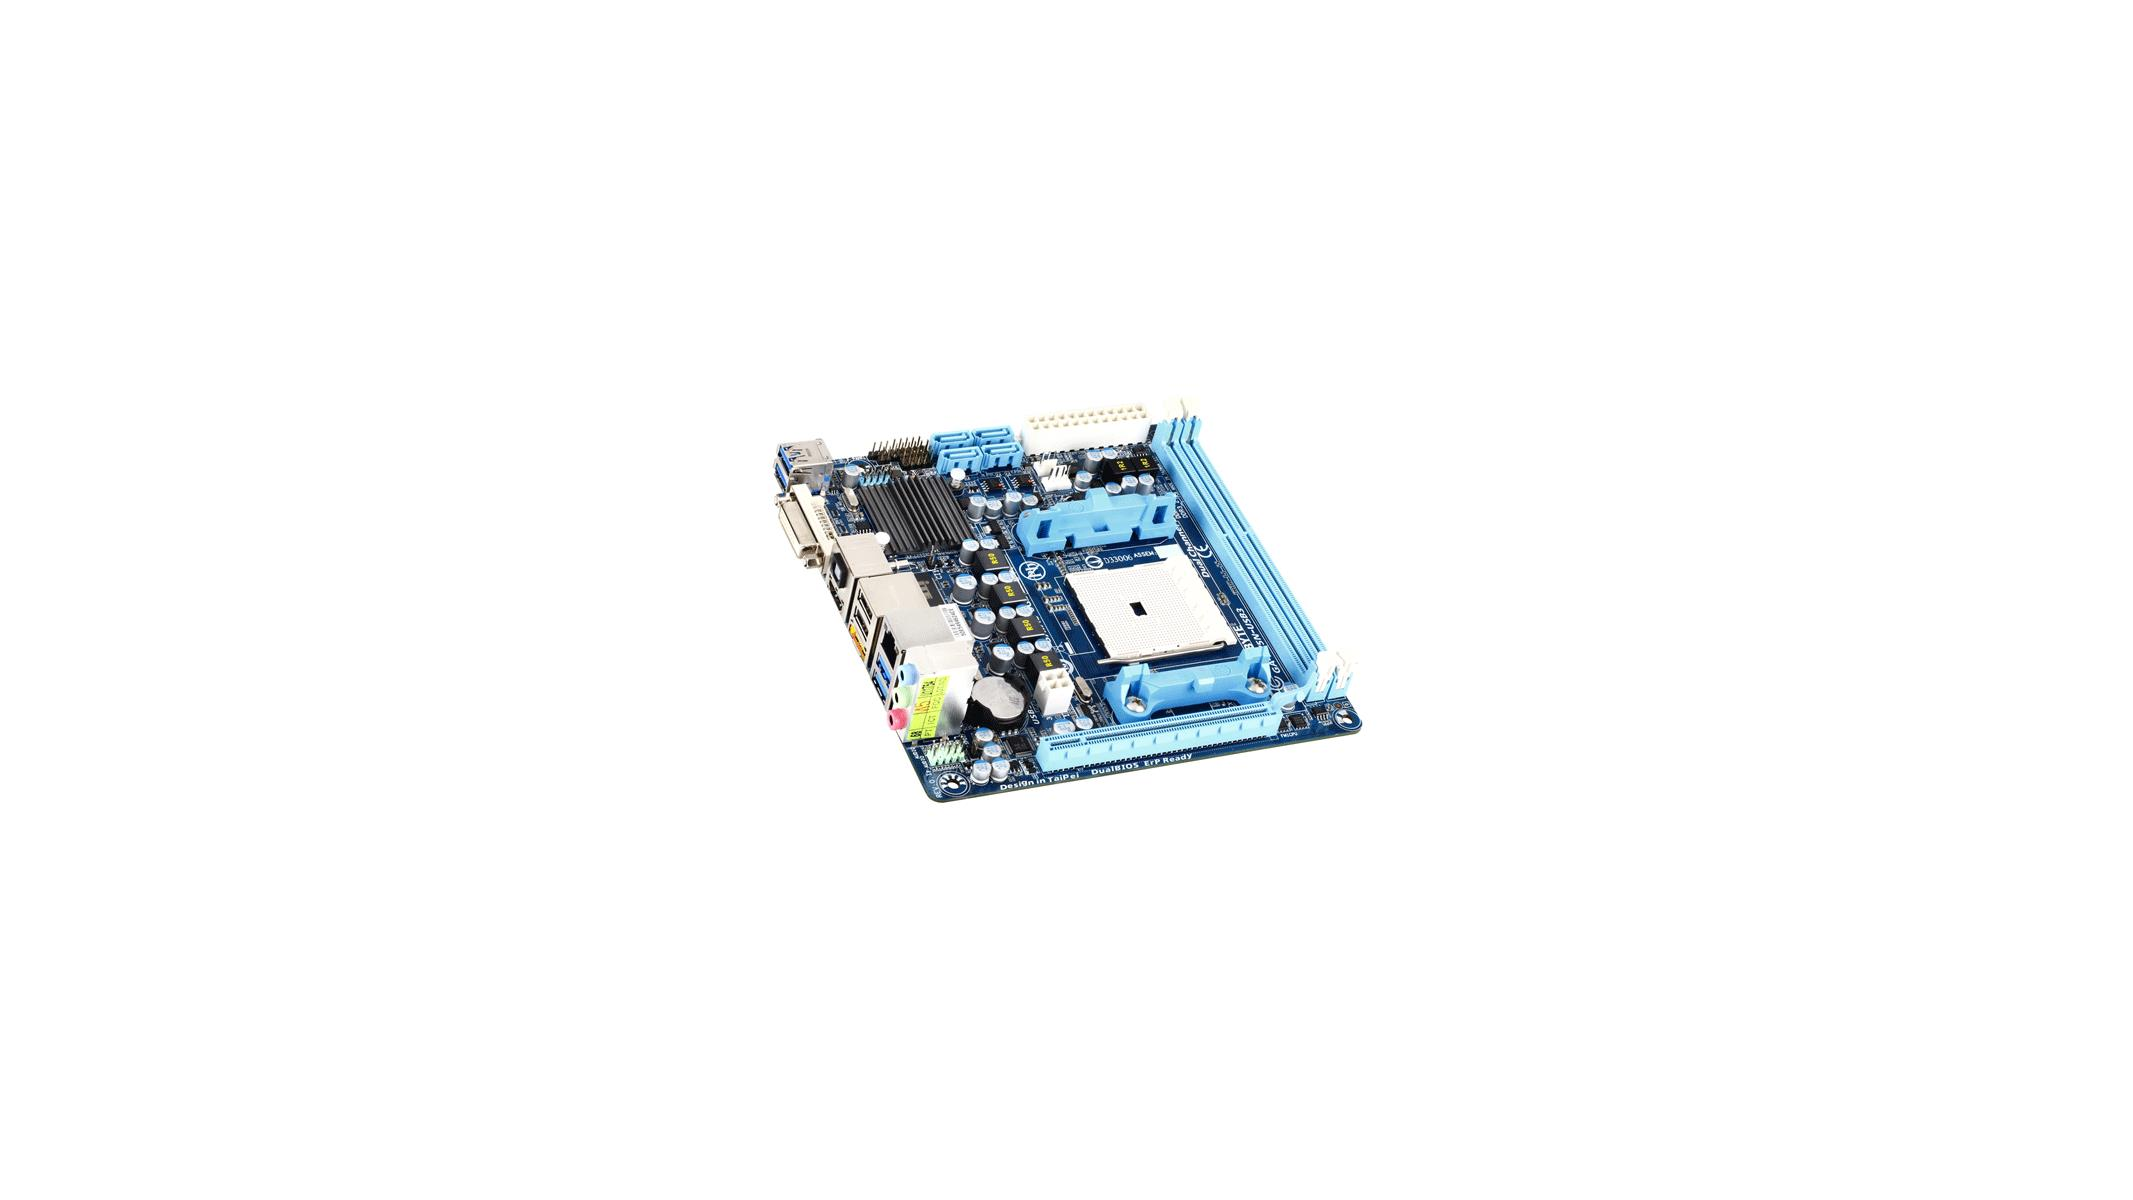 GIGABYTE GA-A75N-USB3 AMD DISPLAY 64BIT DRIVER